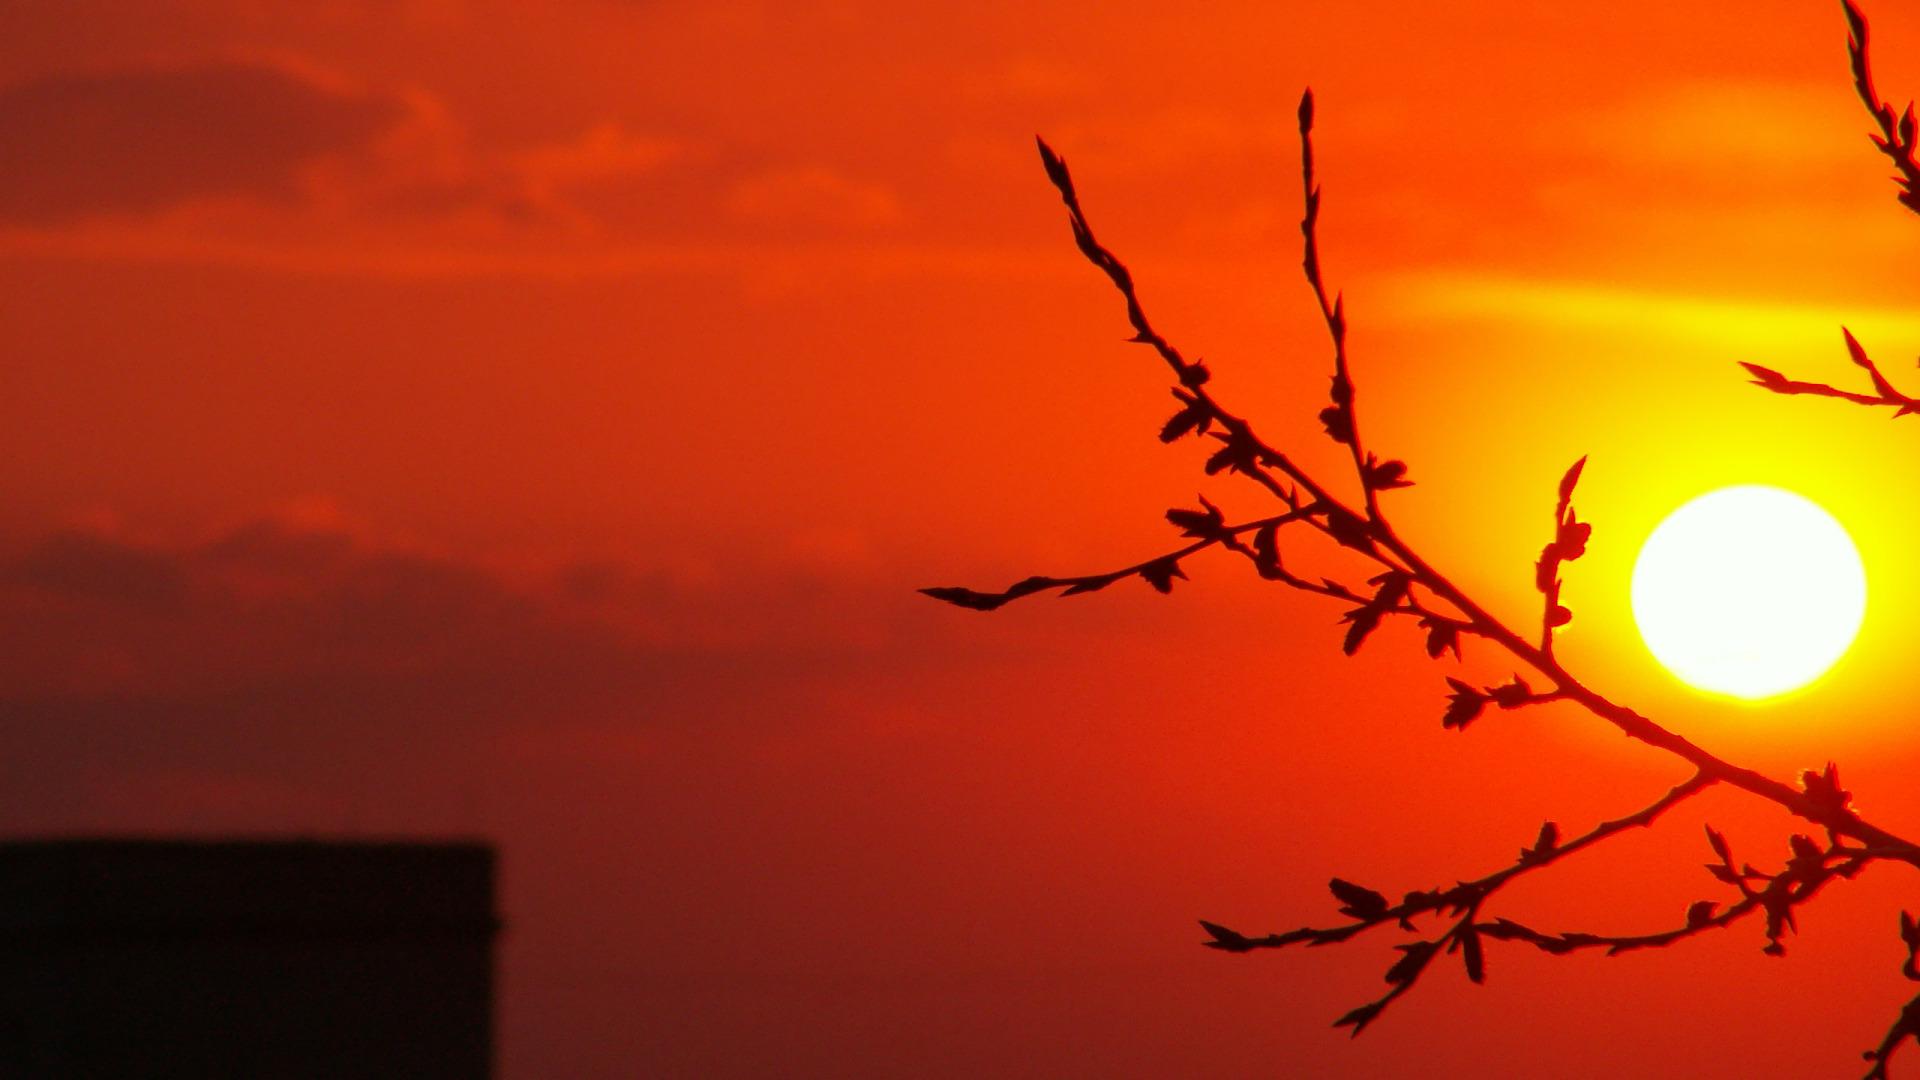 Orange Sunset Wallpaper